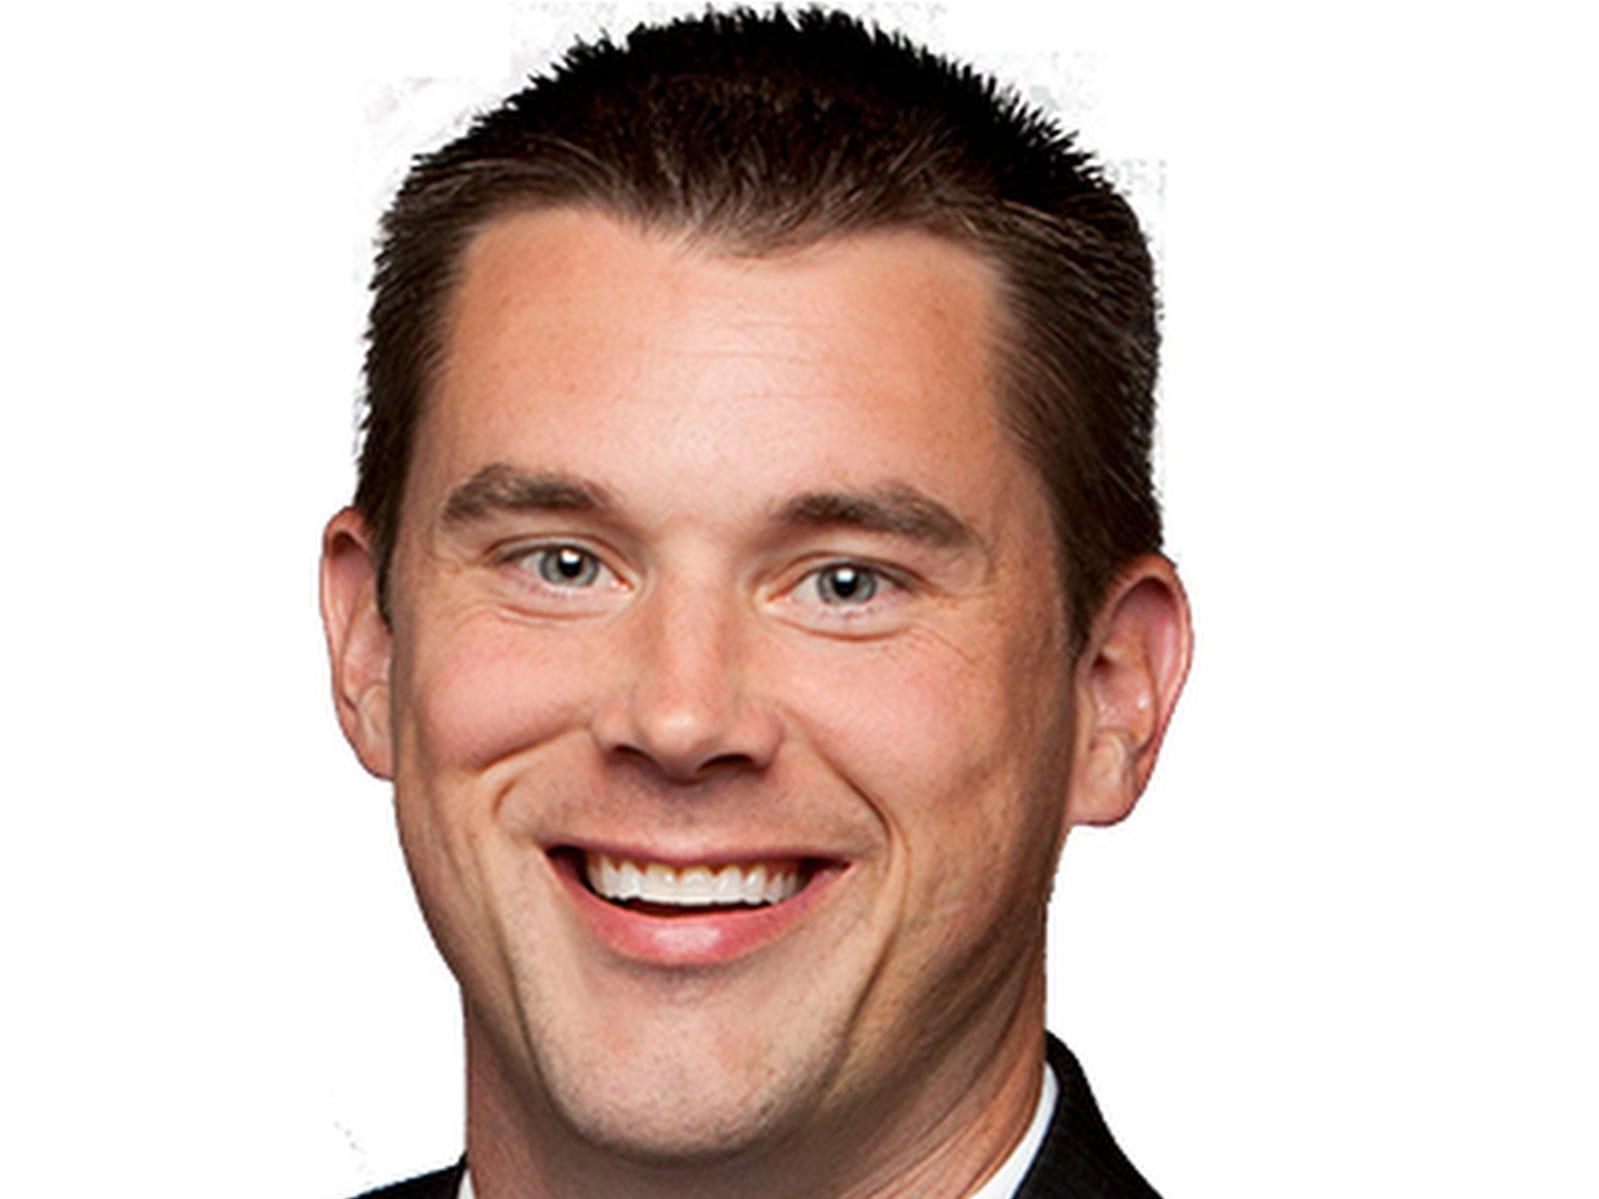 Scott Winkel